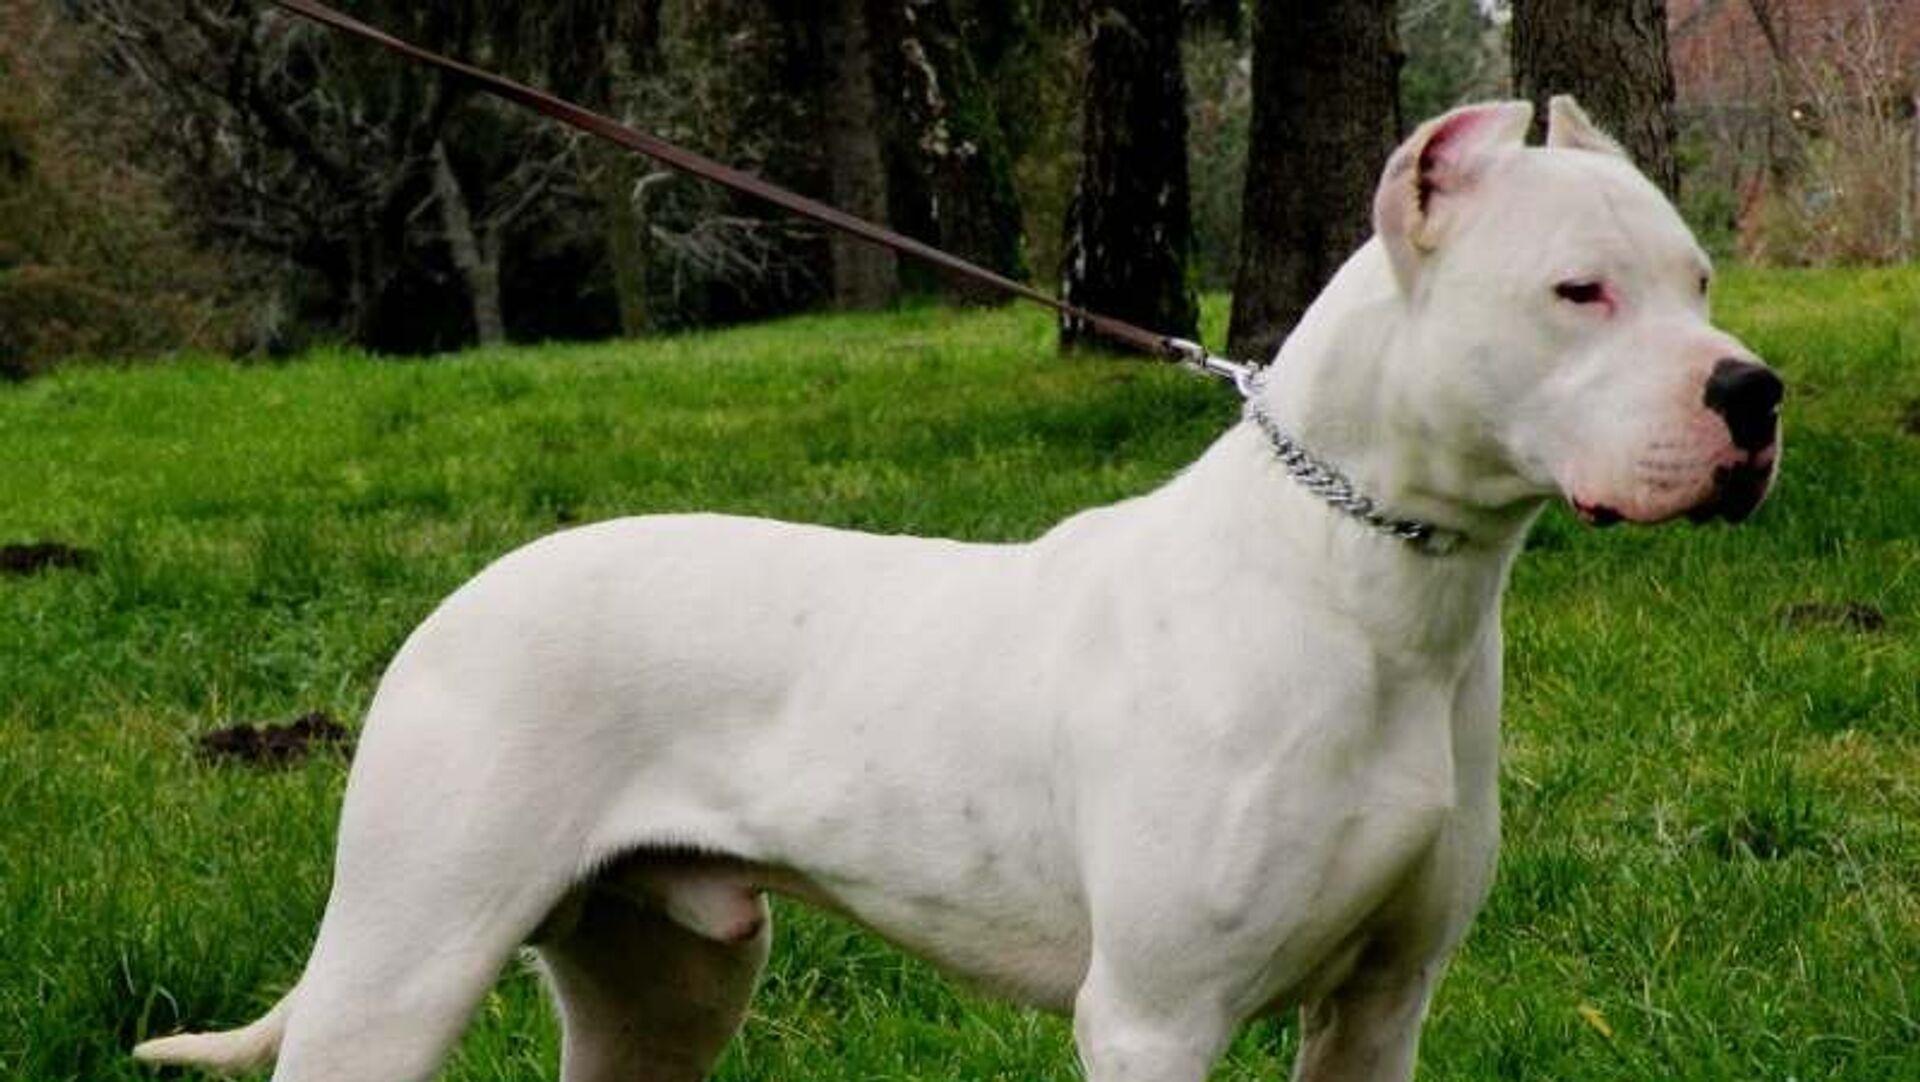 Dogo argentino perro - Sputnik Mundo, 1920, 18.06.2021